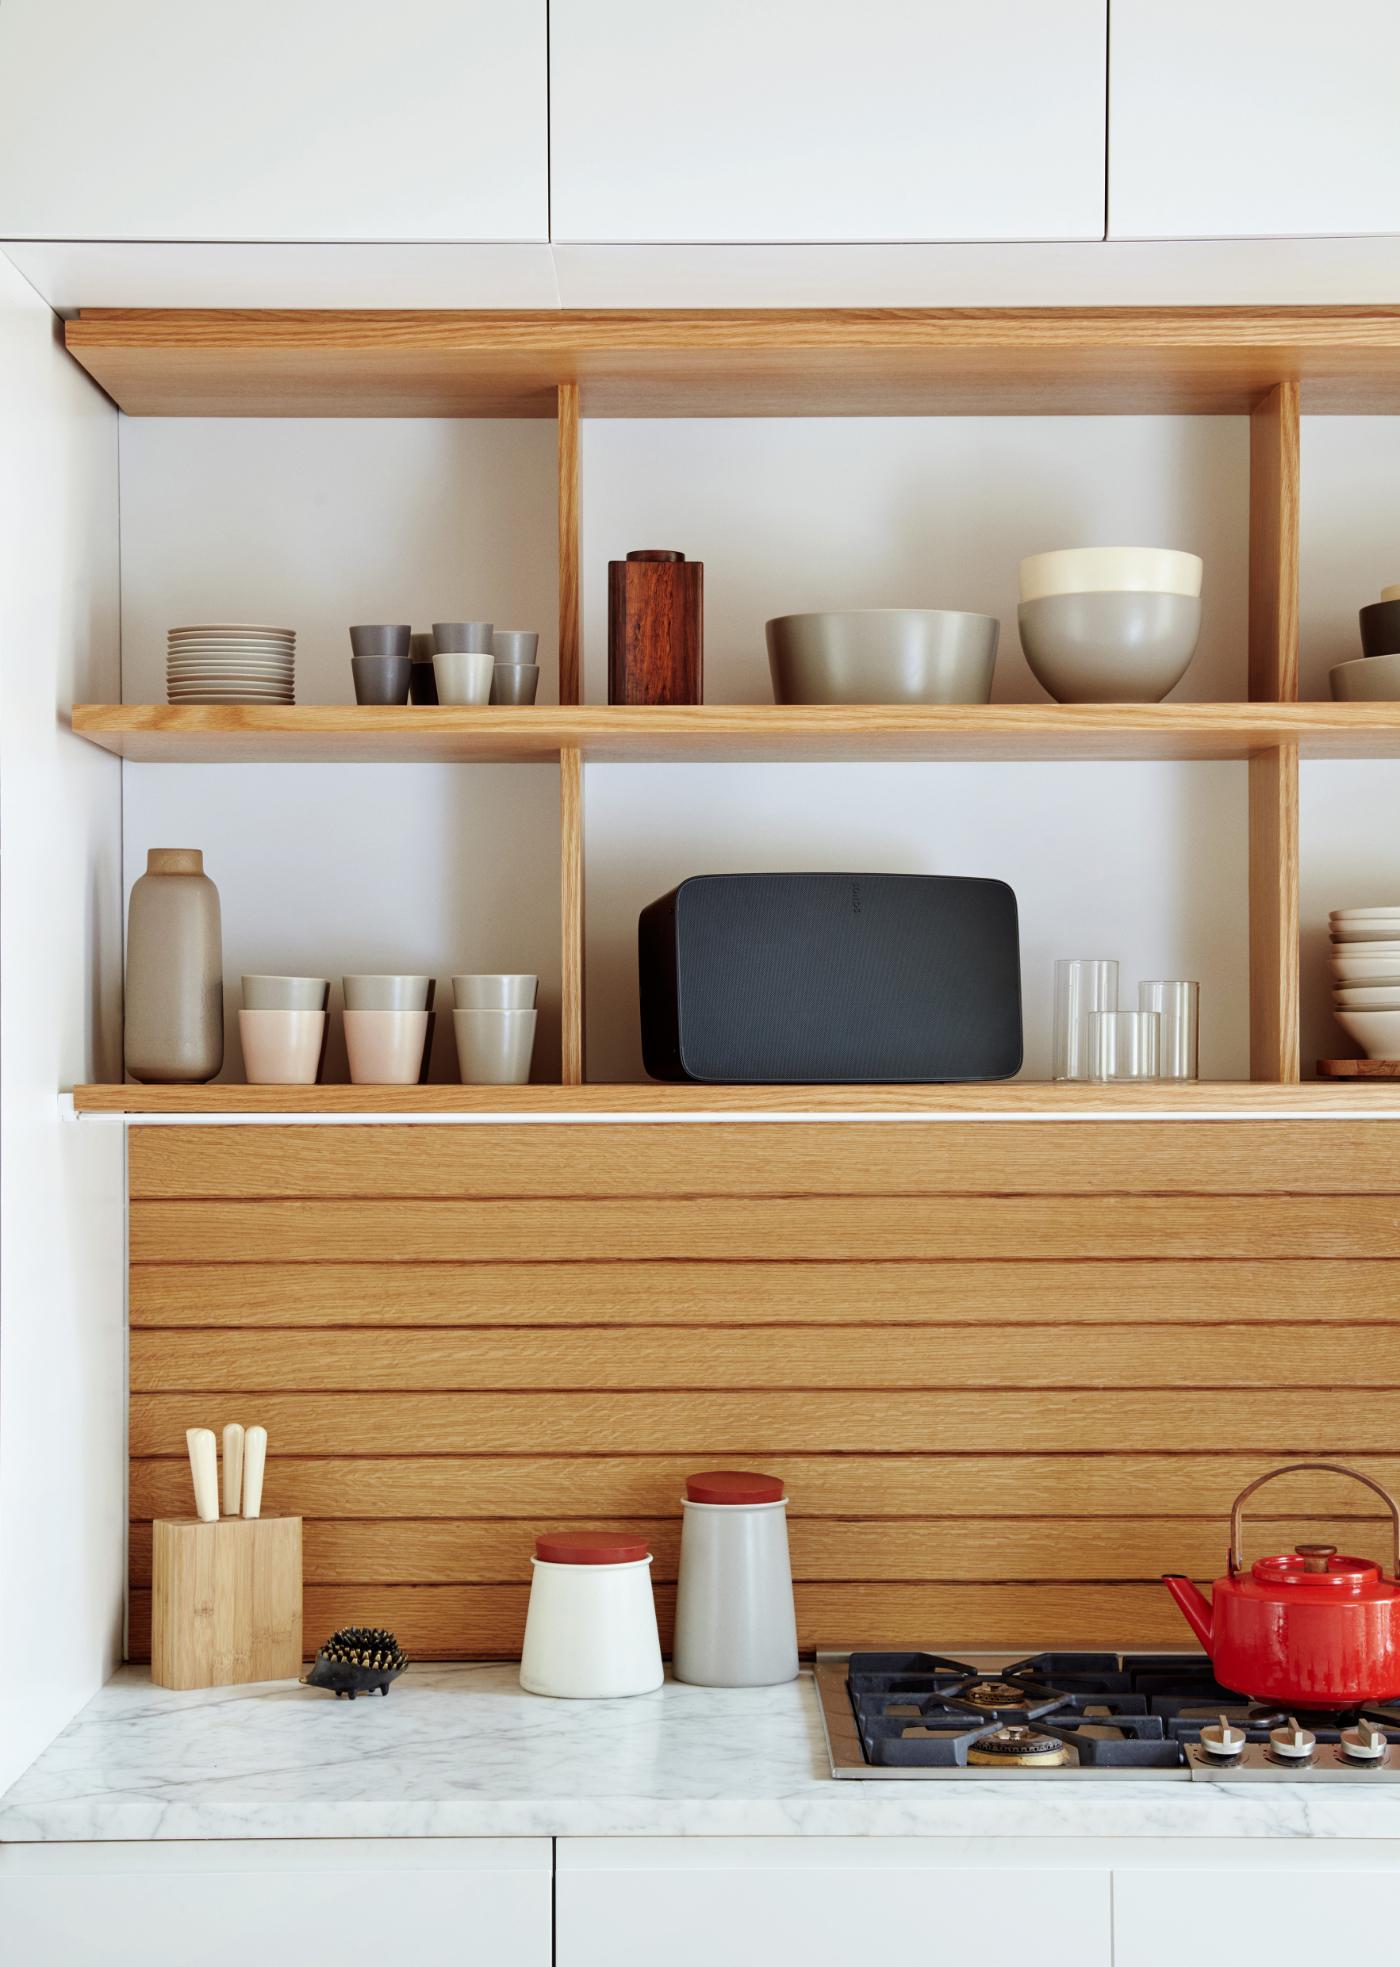 Five_Black-Lifestyle-Kitchen-Q3FY20_MST-MST_JPEG_fid87513